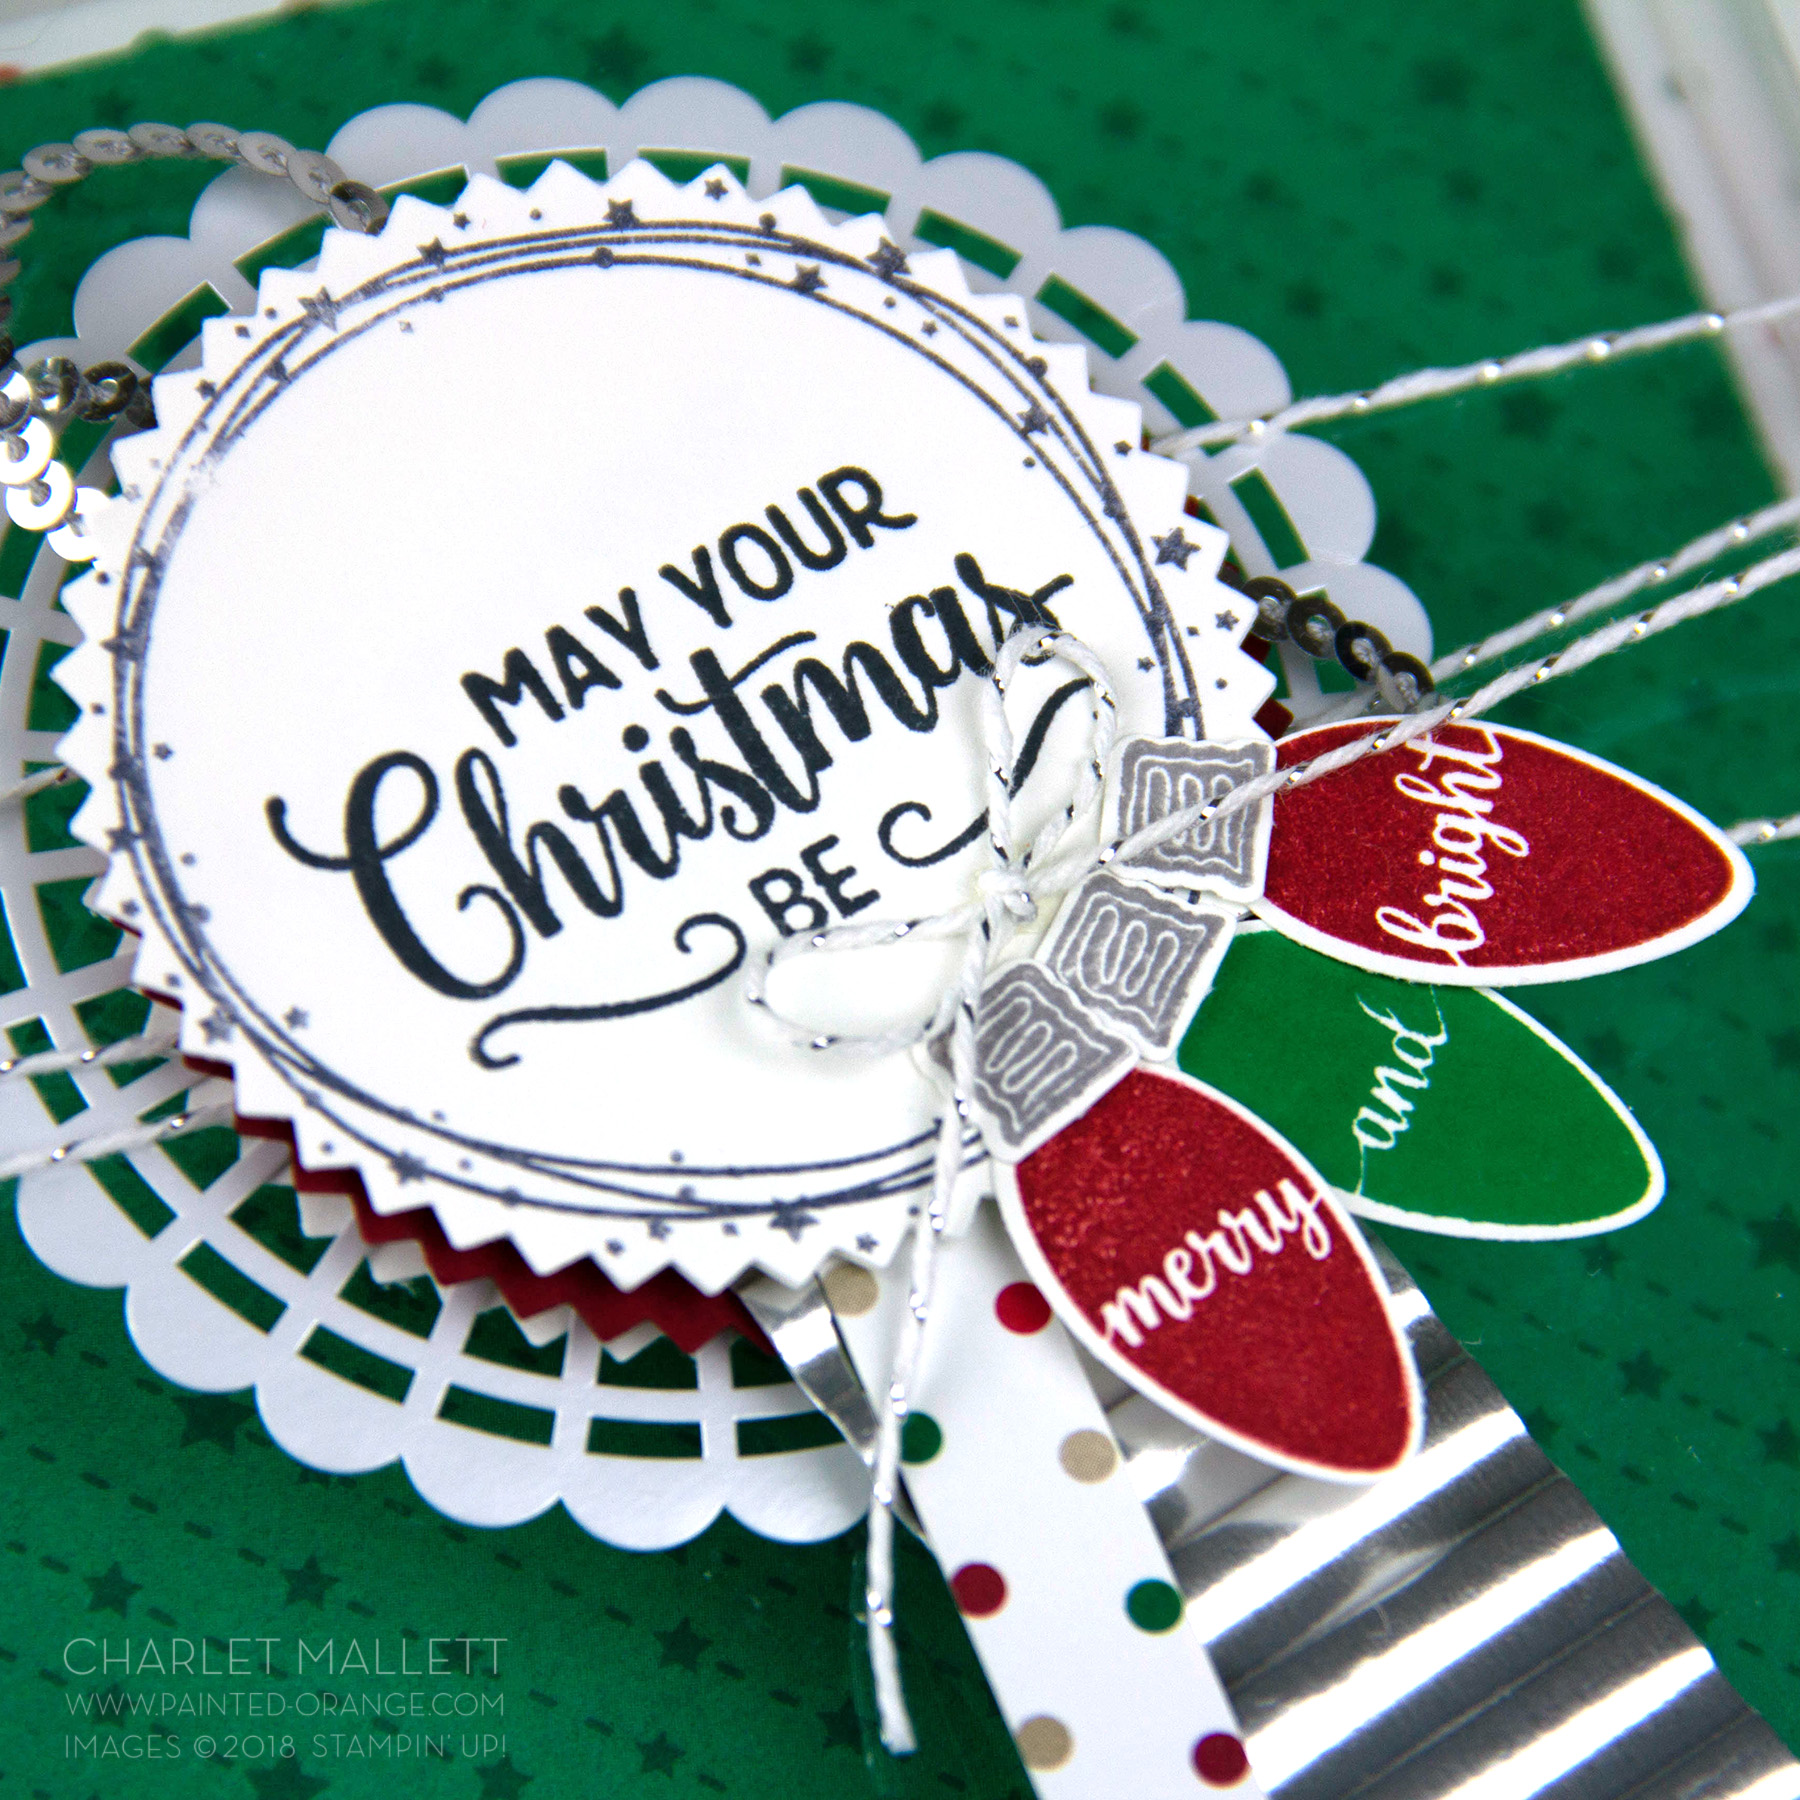 Making Christmas Bright - Charlet Mallett, Stampin' Up!